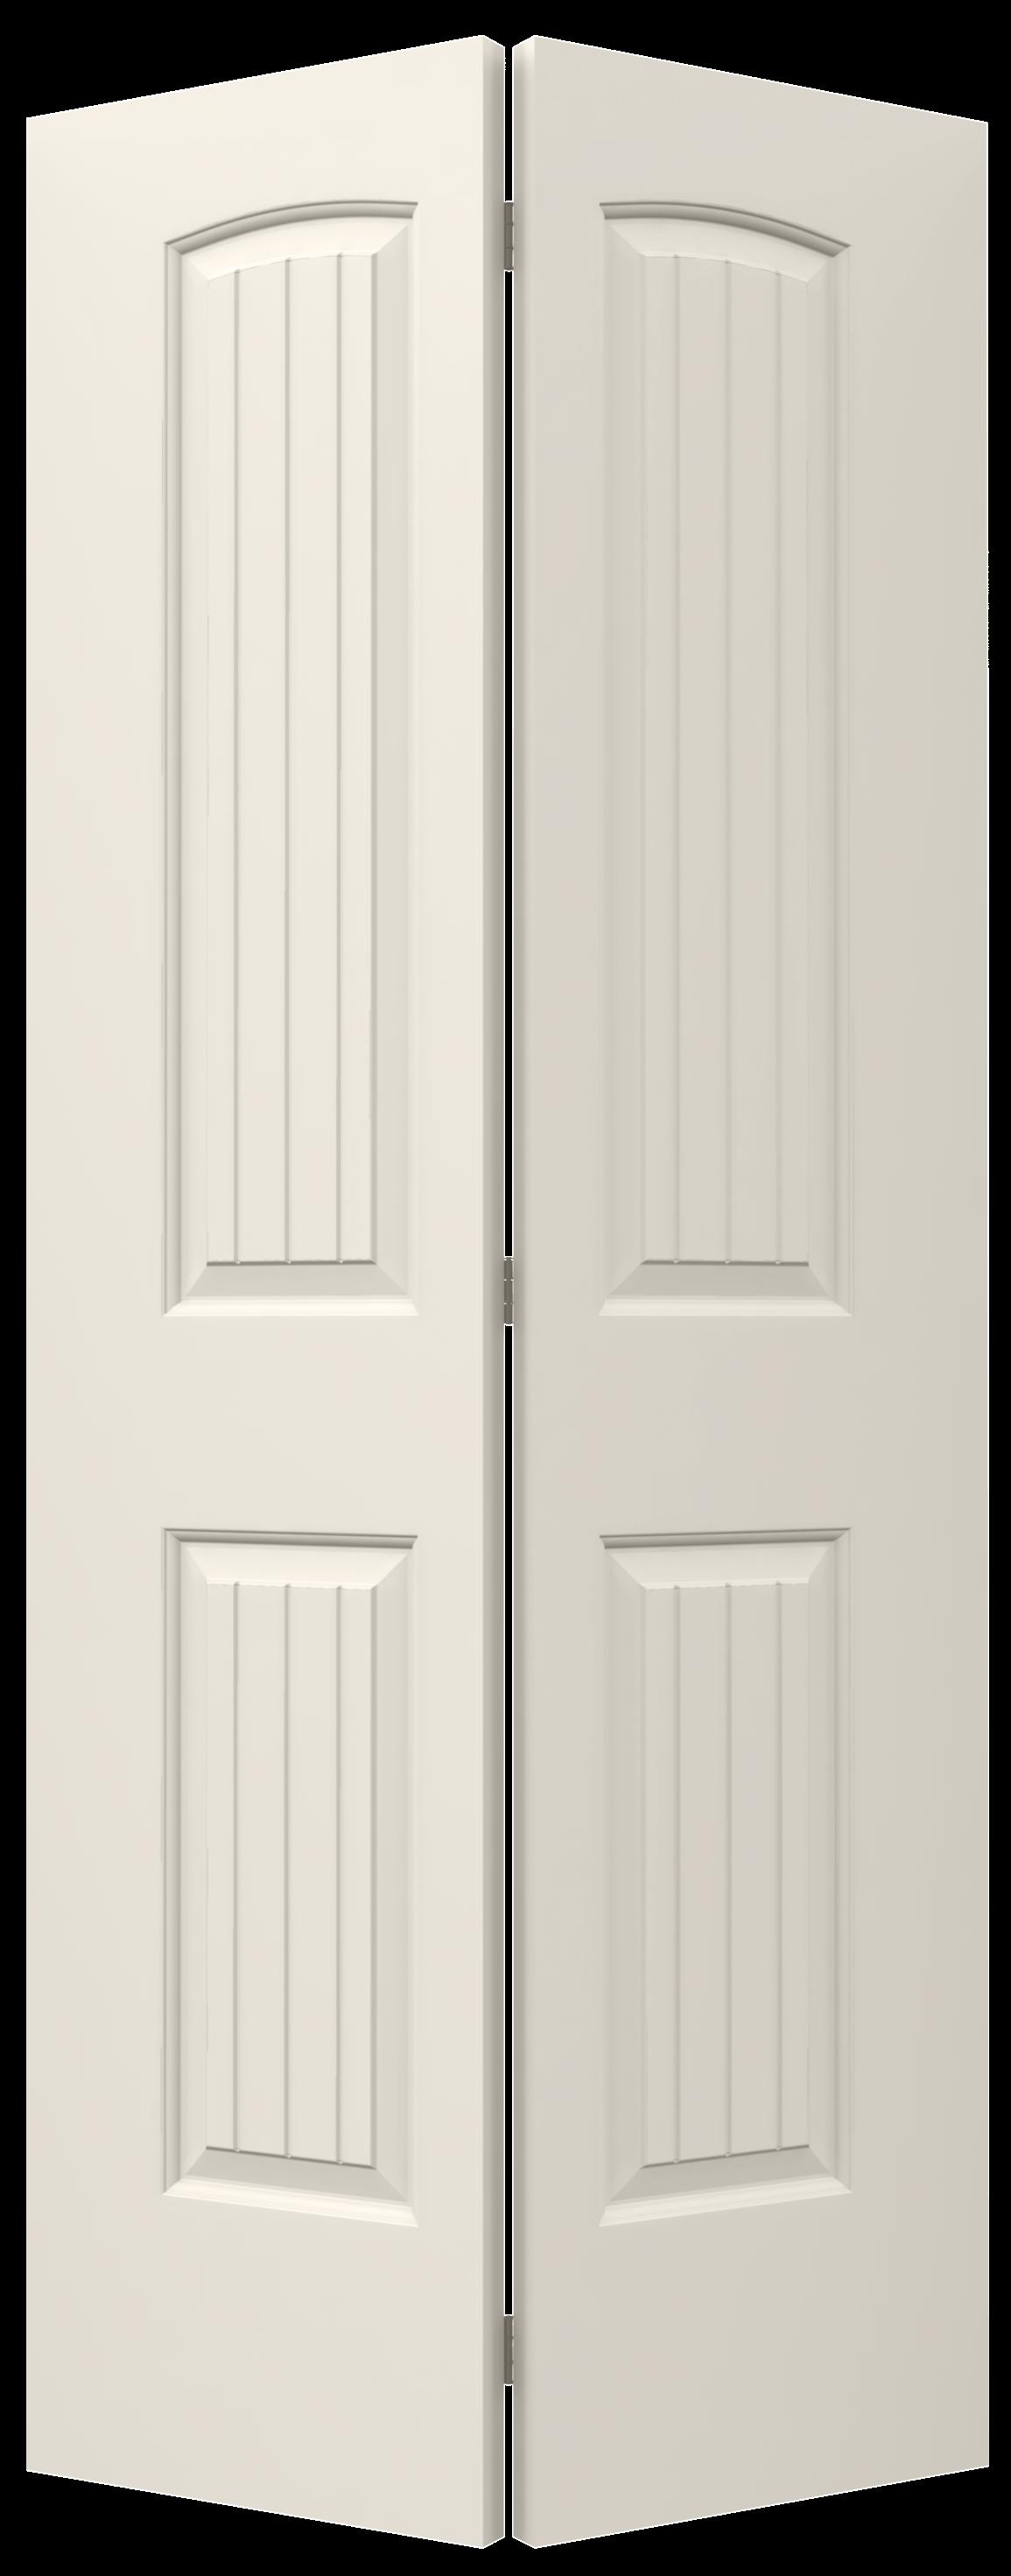 Molded Wood Composite Interior Doors Santa Fe Smooth Bifold